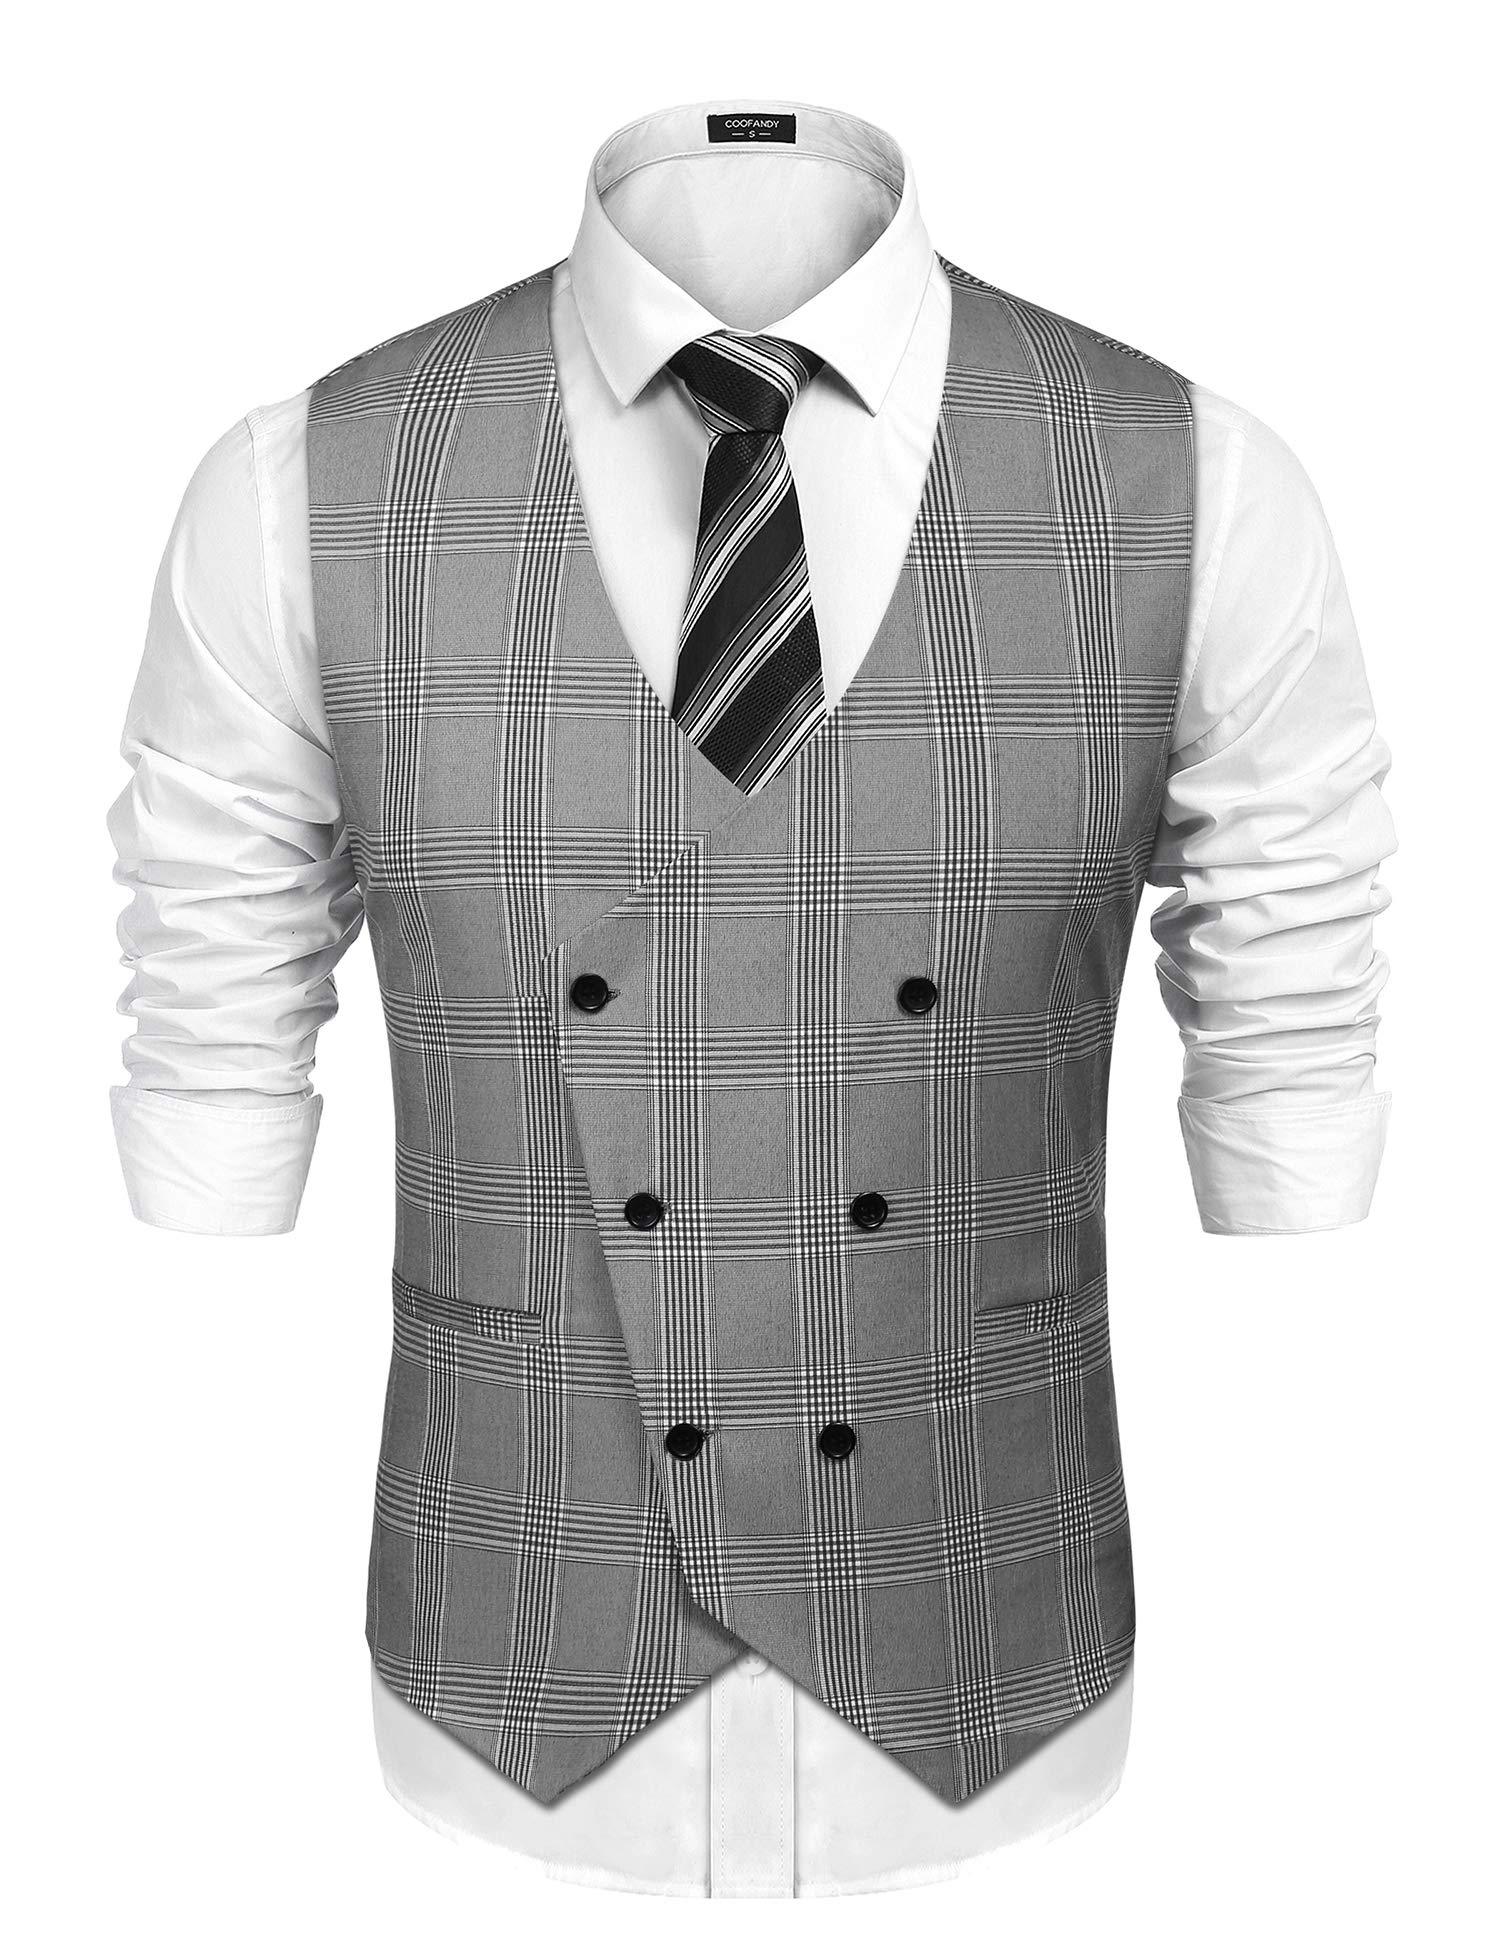 COOFANDY Men's Suit Vest Designer Plaid V-Neck Double Breasted Slim Fit Business Dress Waistcoat